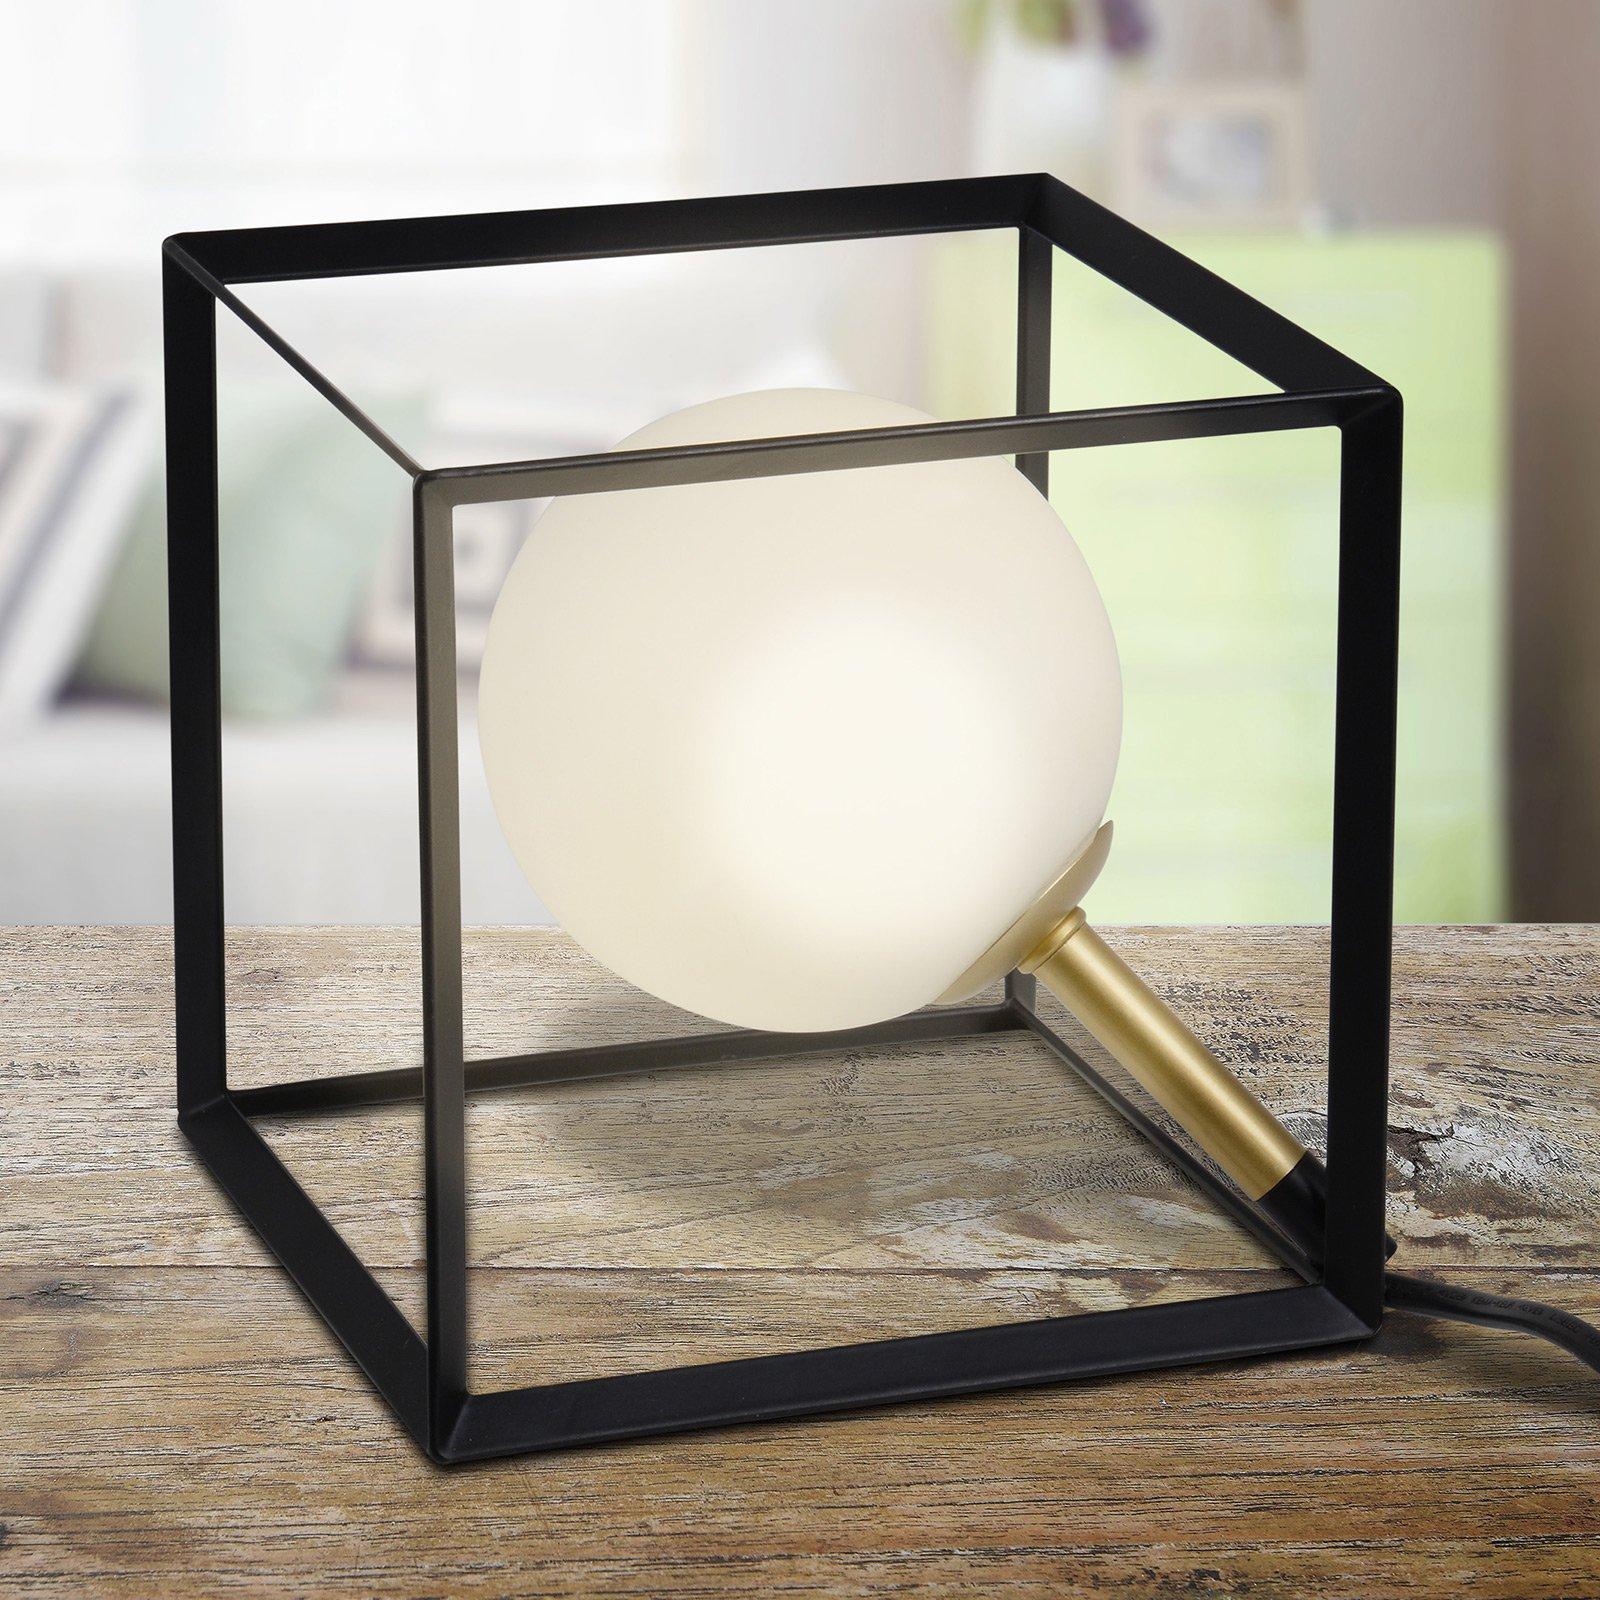 3168922 LED-bordlampe i markant terningutseende